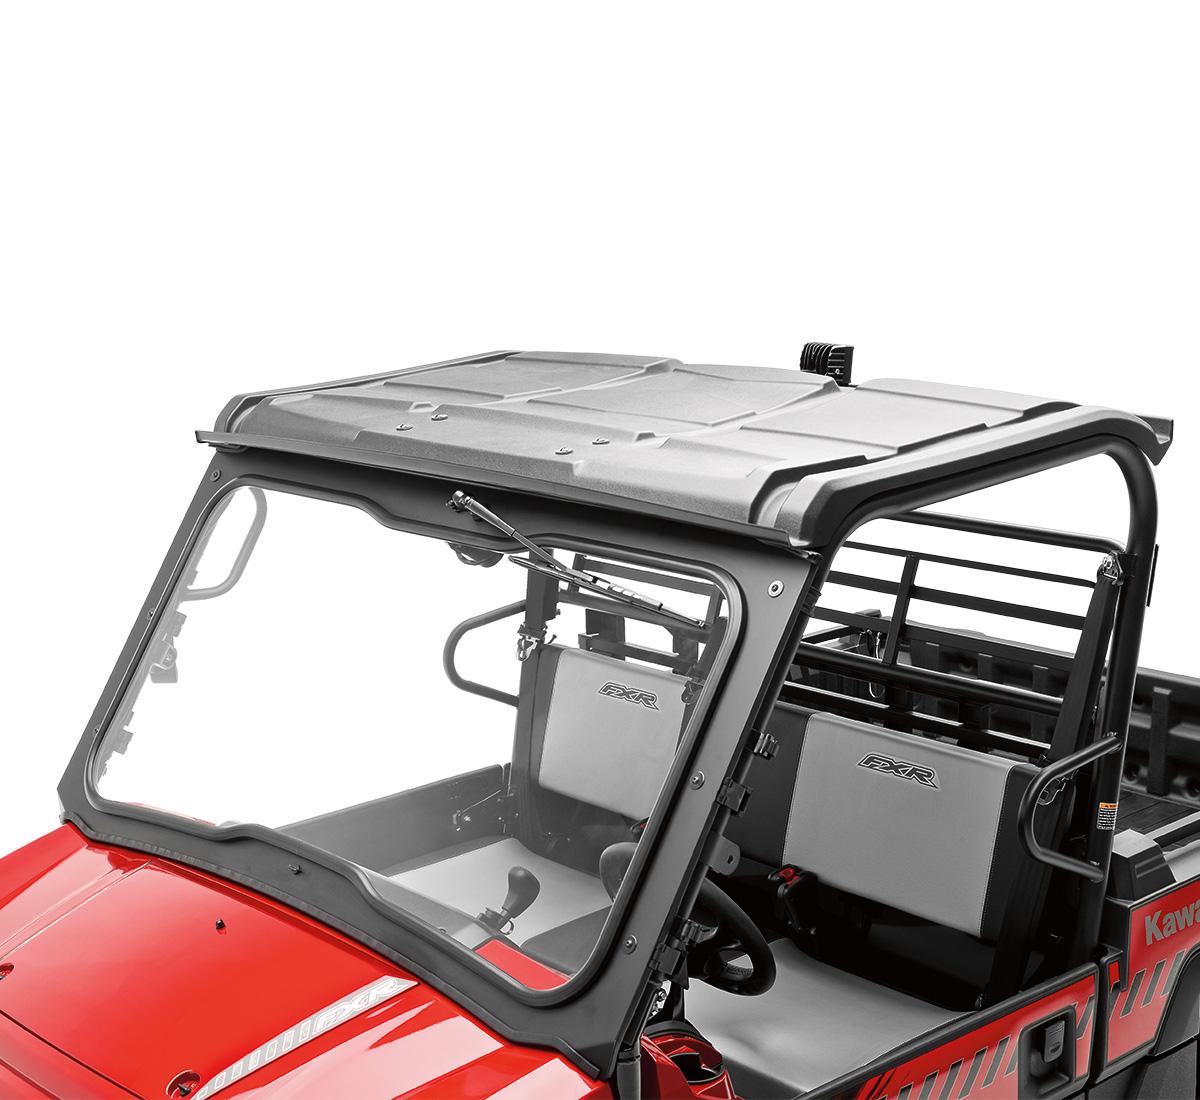 Kawasaki Mule Windshield For Sale